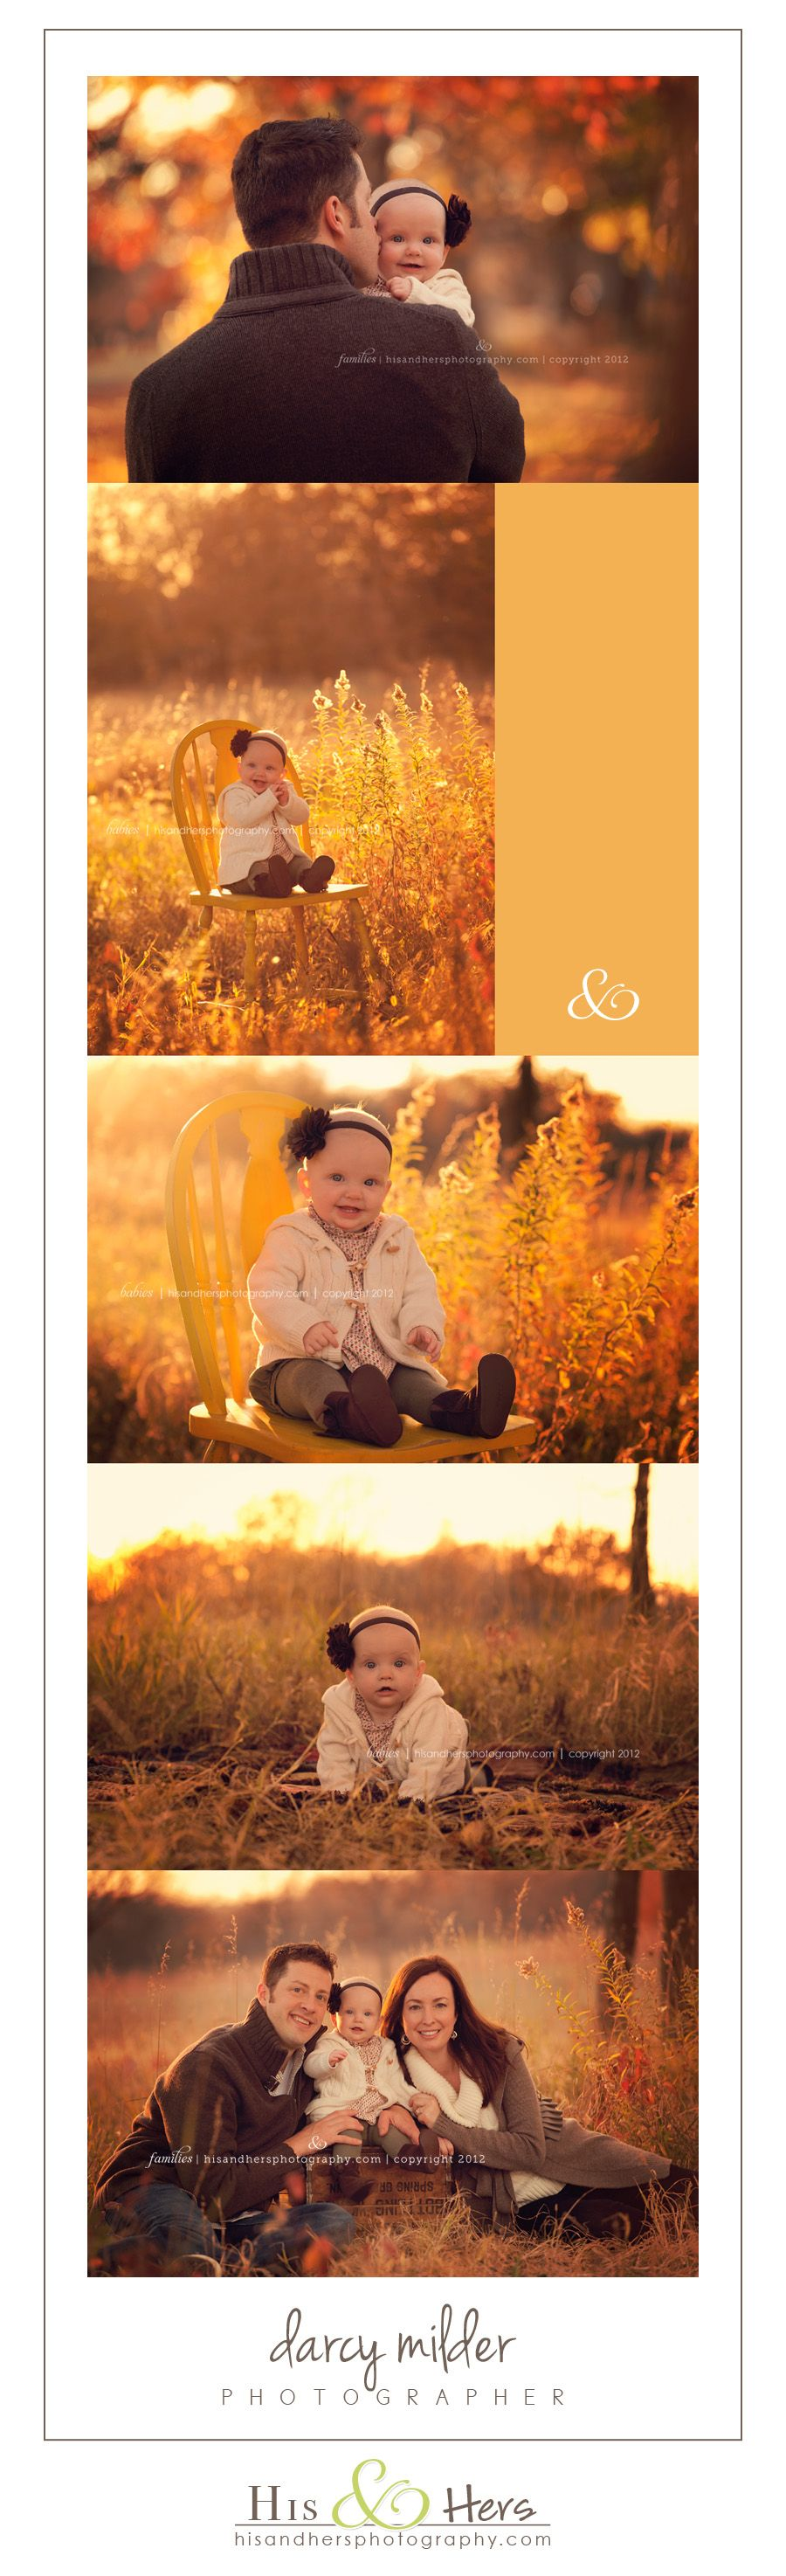 Iowa Children & Family Photographer   Charlotte 6 months old